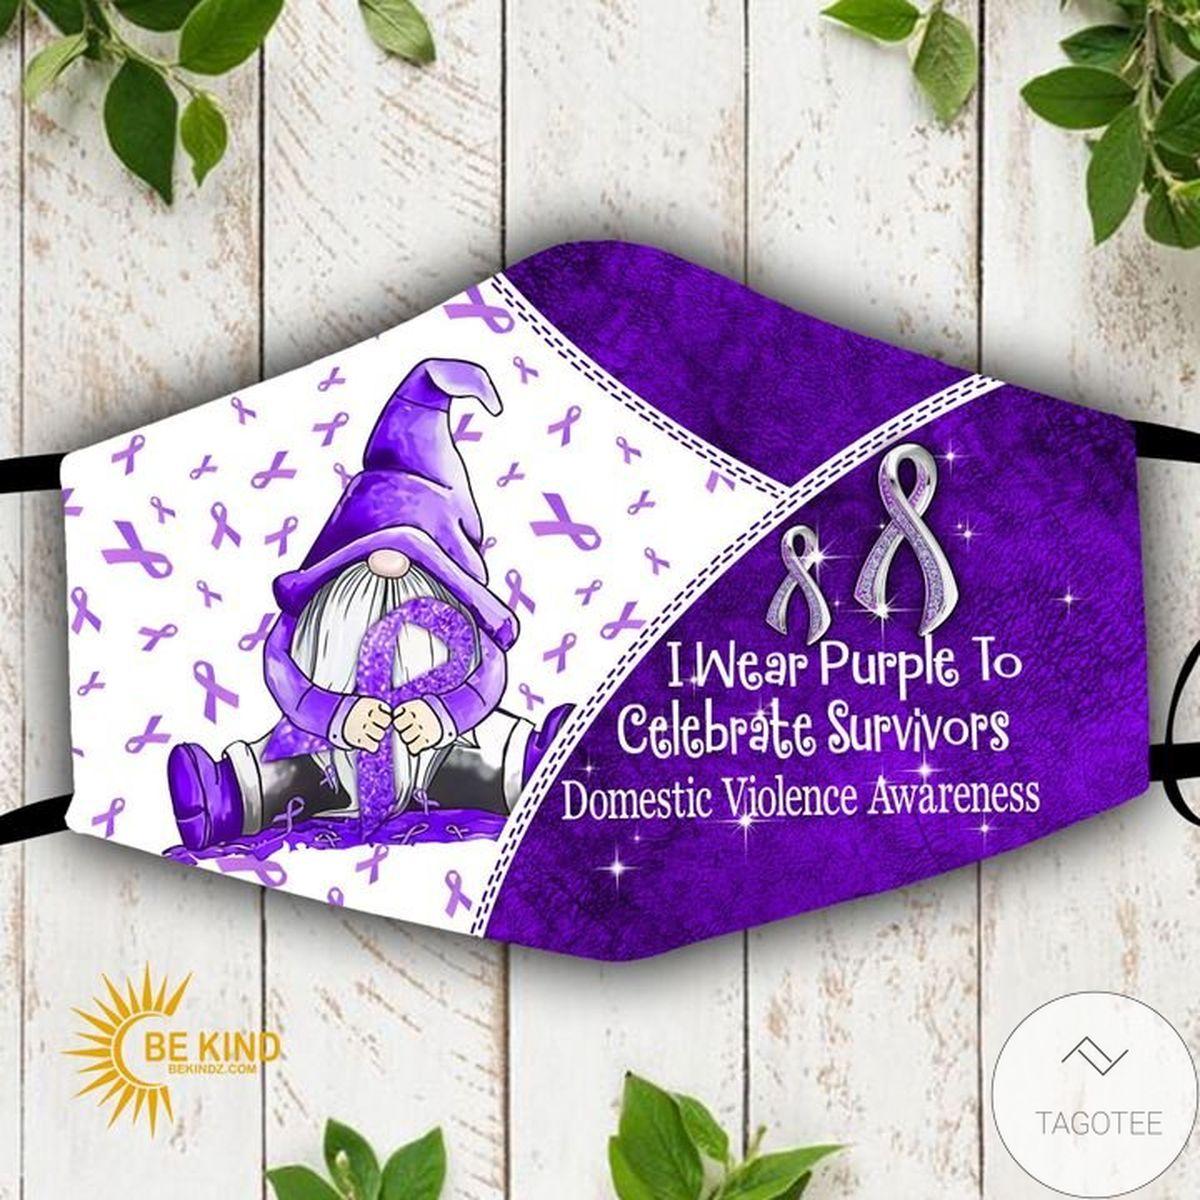 Domestic Violence Awareness I Wear Purple To Celebrate Survivors Face Mask